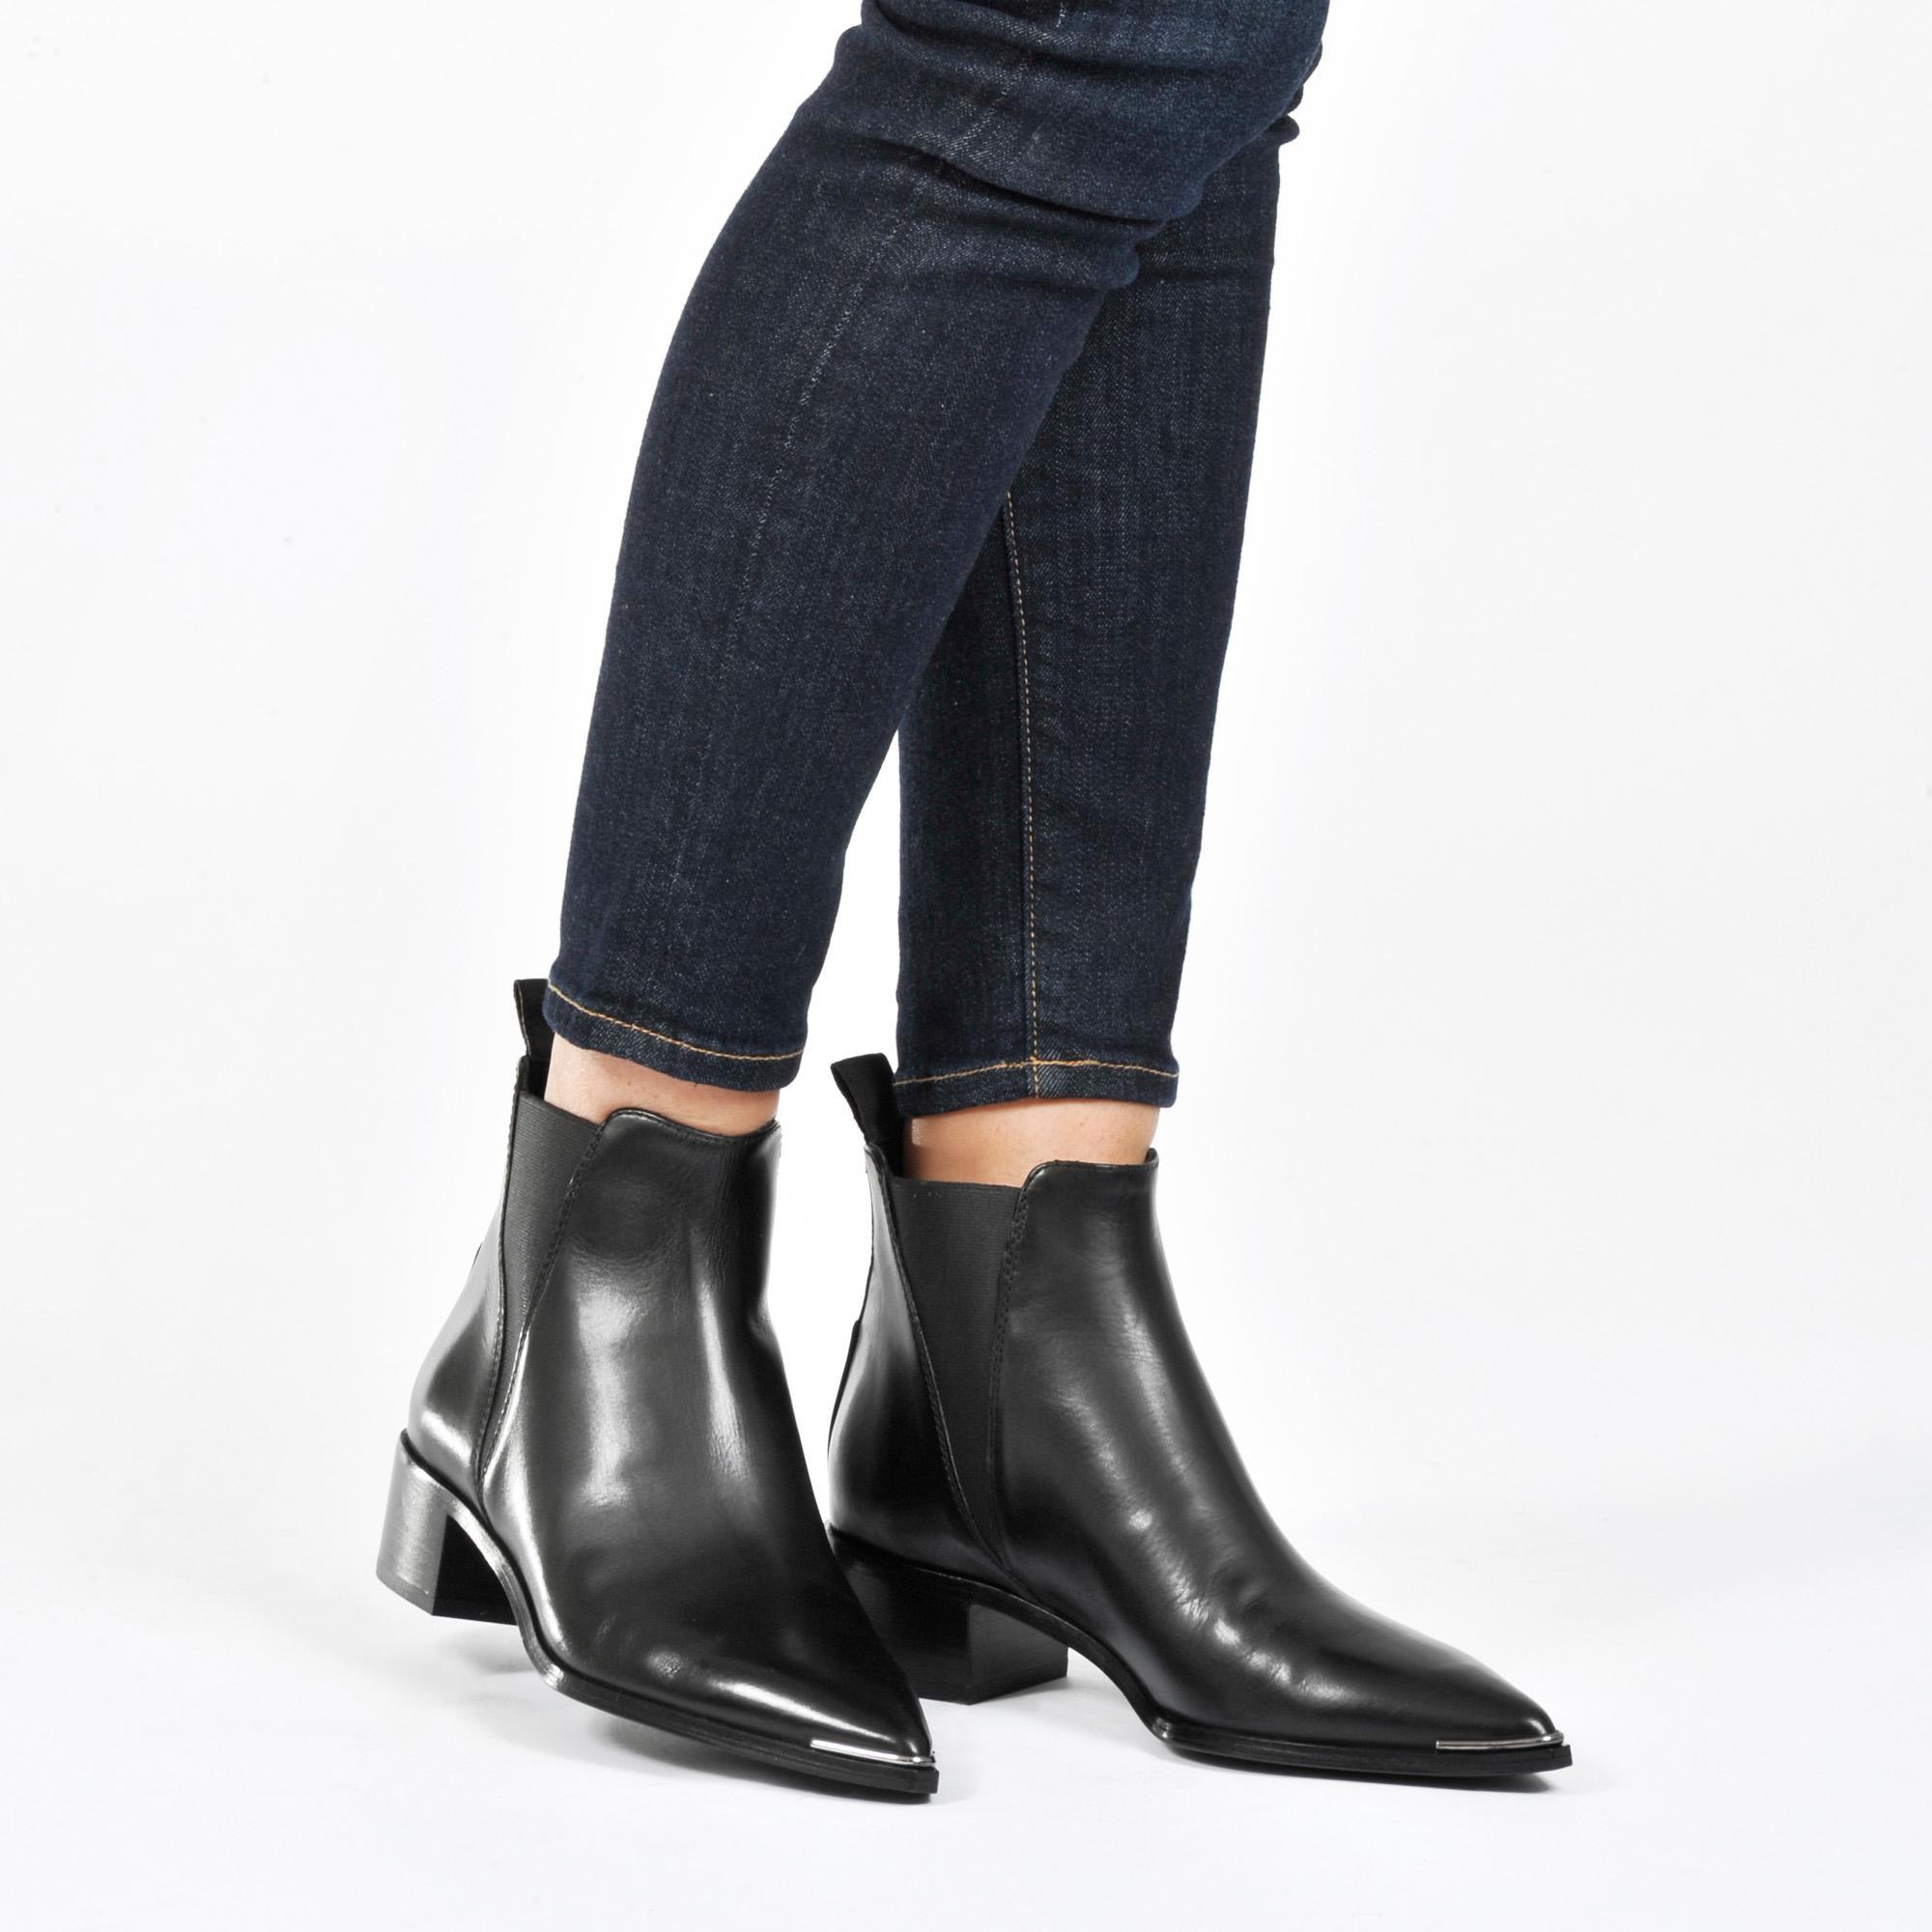 Acne Studios Jensen Flat Boot in Black